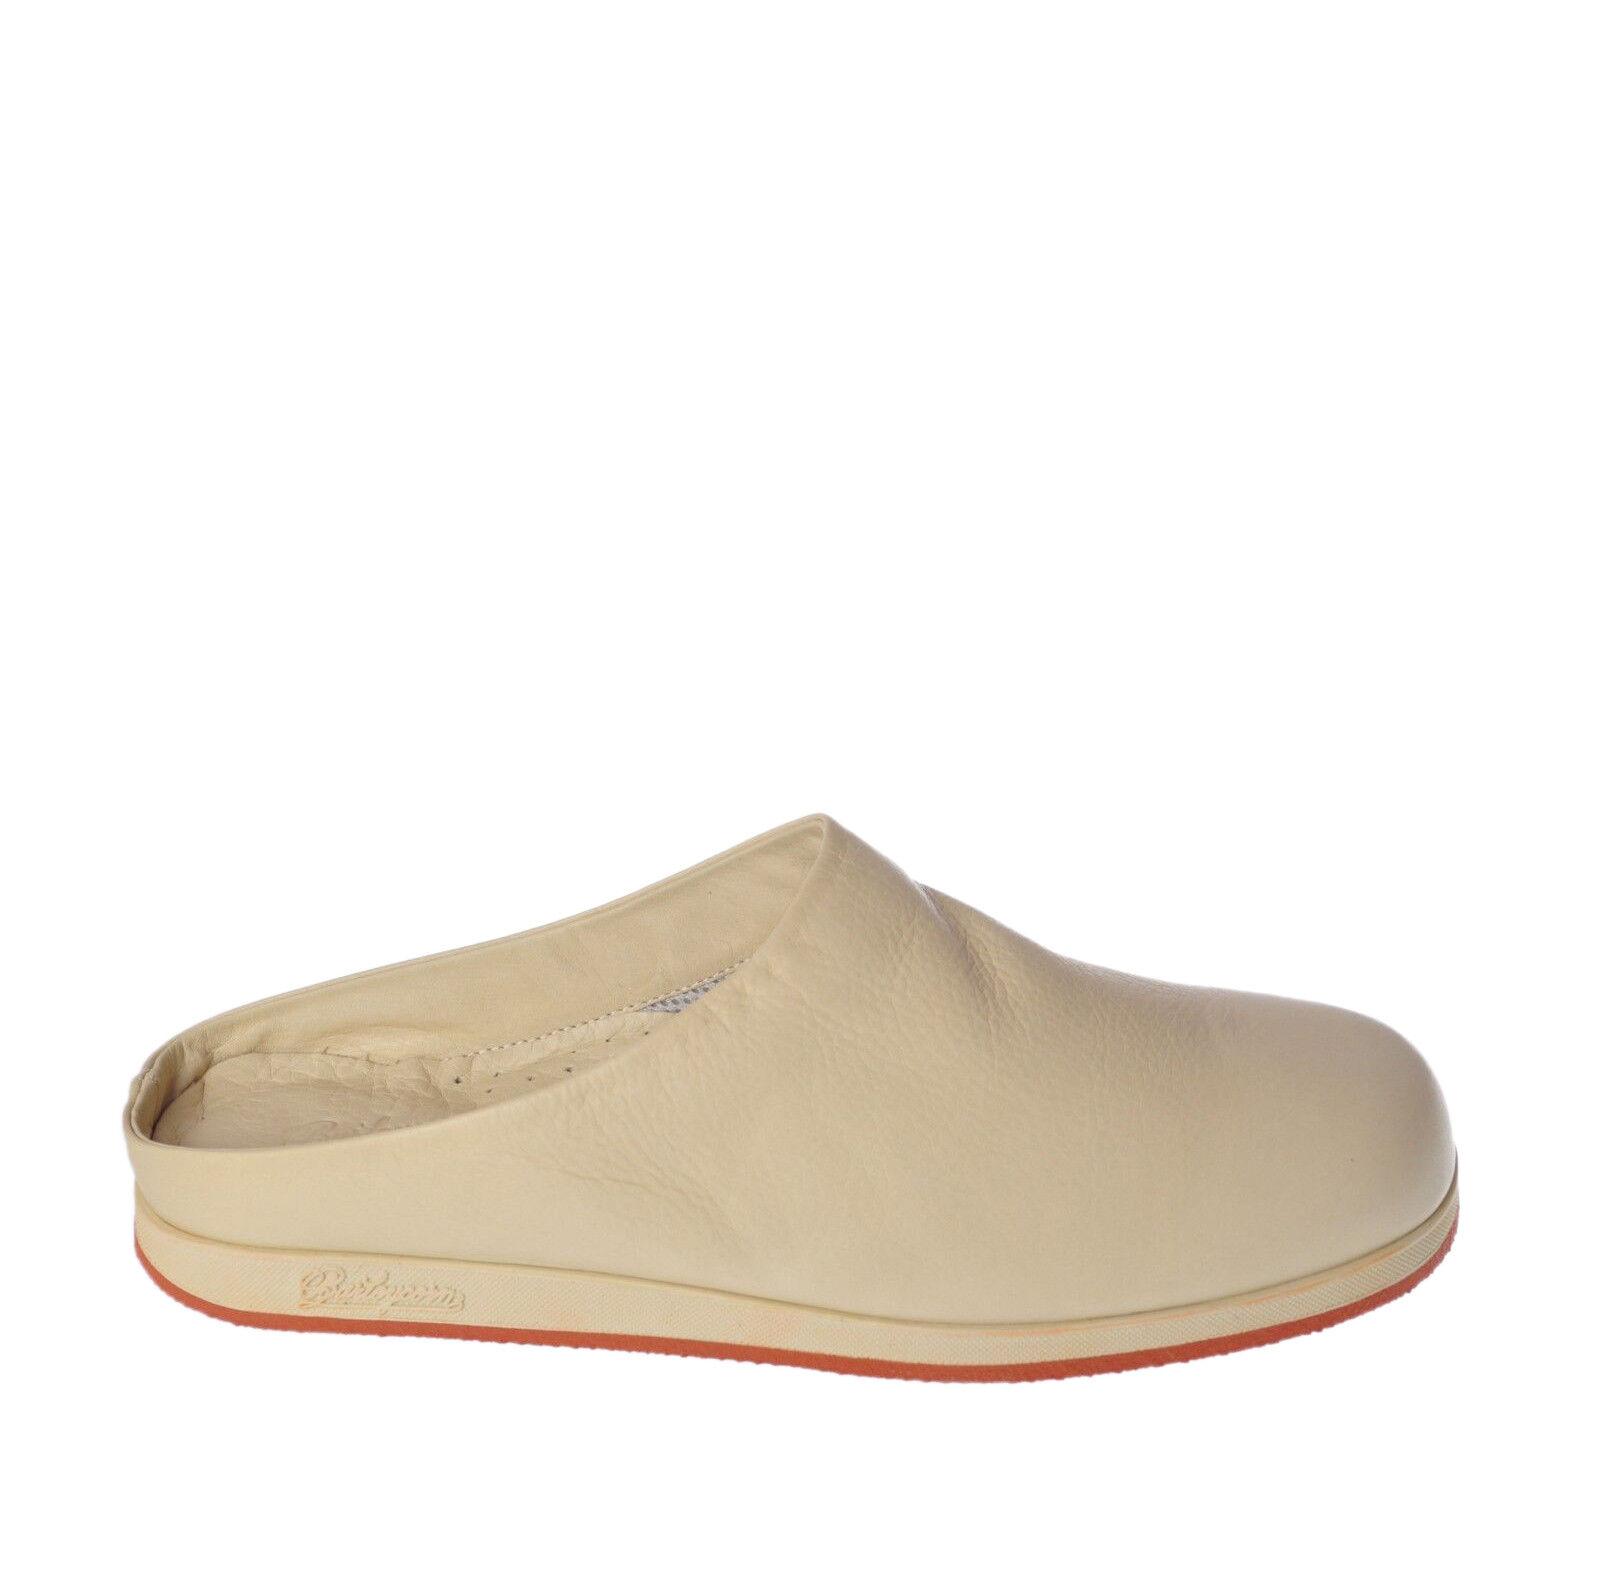 Zapatos de mujer baratos zapatos de mujer Barleycorn - Shoes-Moccasins - Woman - White - 5143520C183943